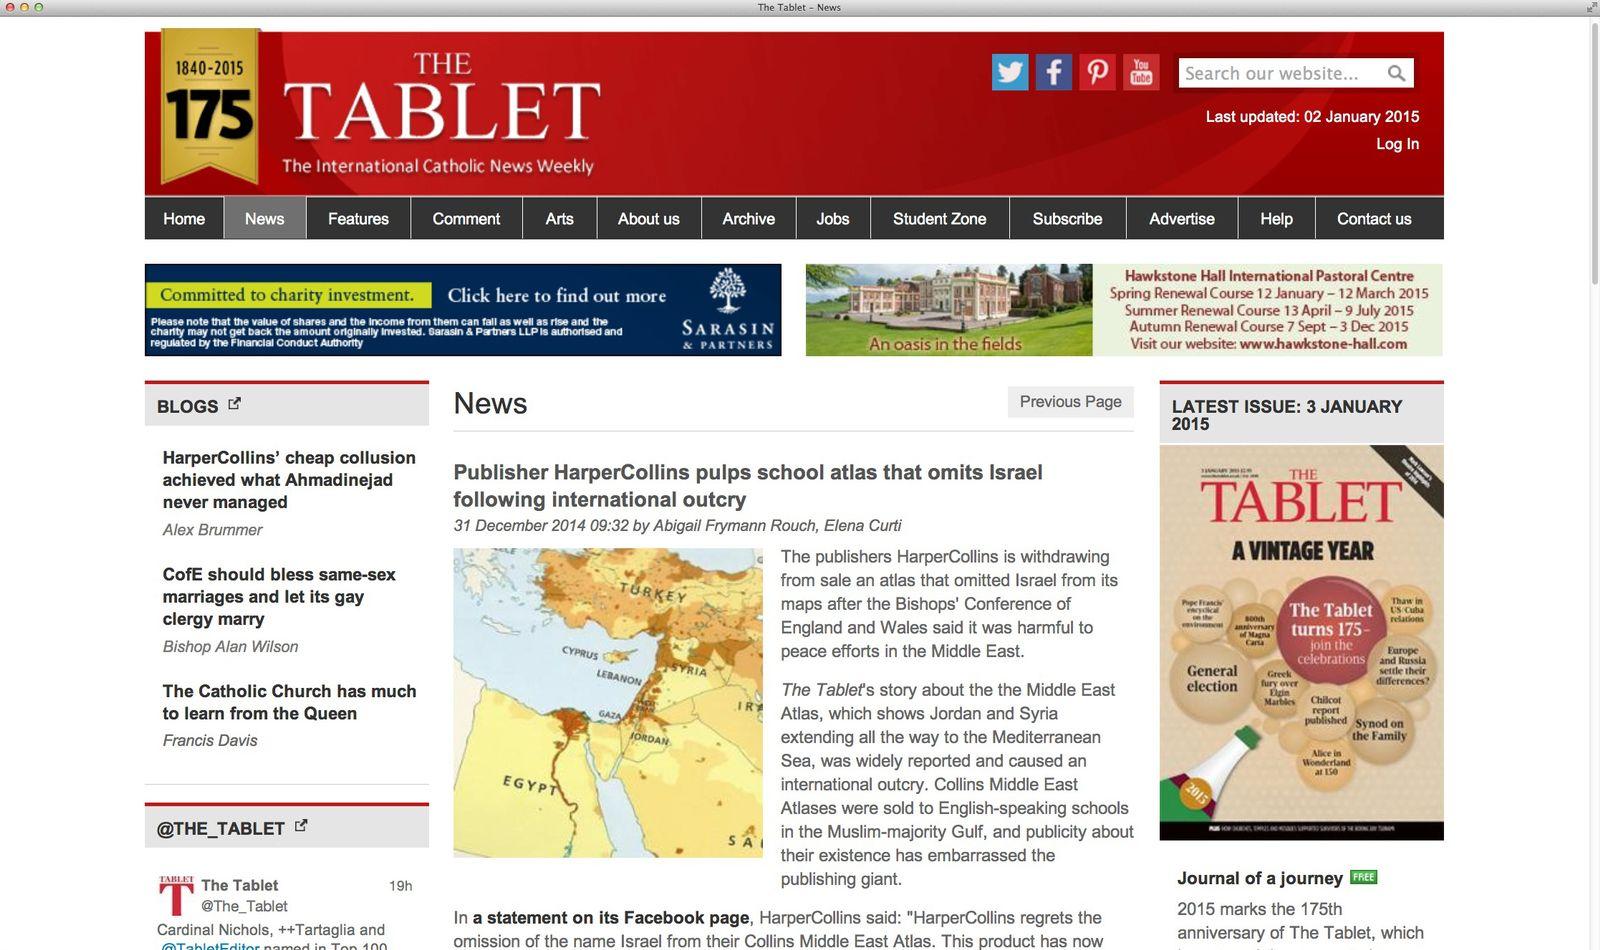 EINMALIGE VERWENDUNG NUR ALA ZITAT Screenshot/ The Tablet